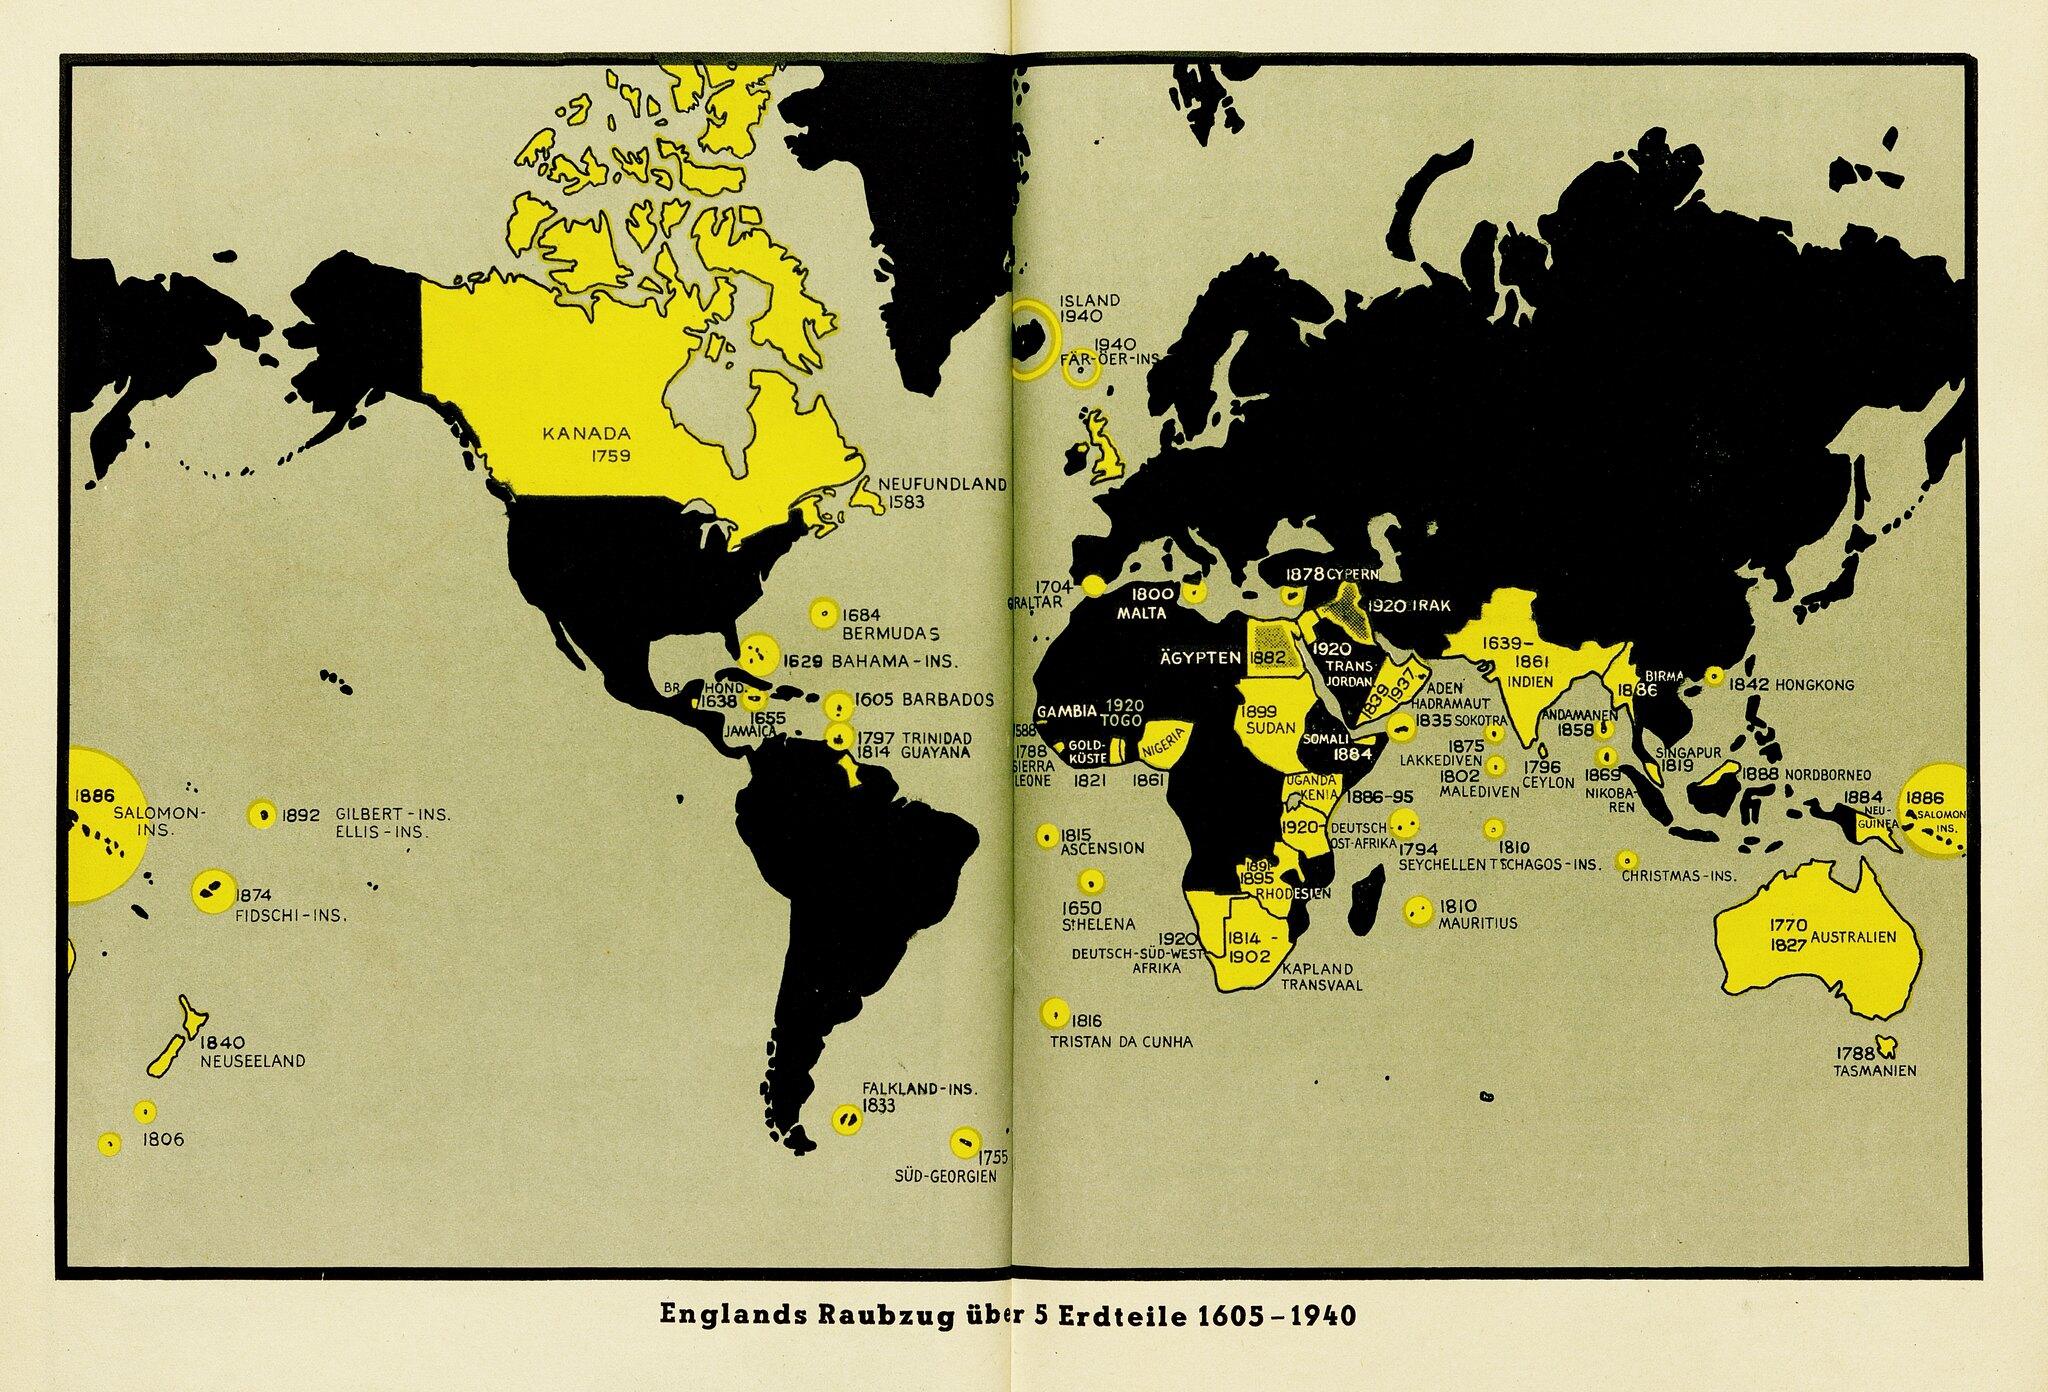 1940 German propaganda map of the British